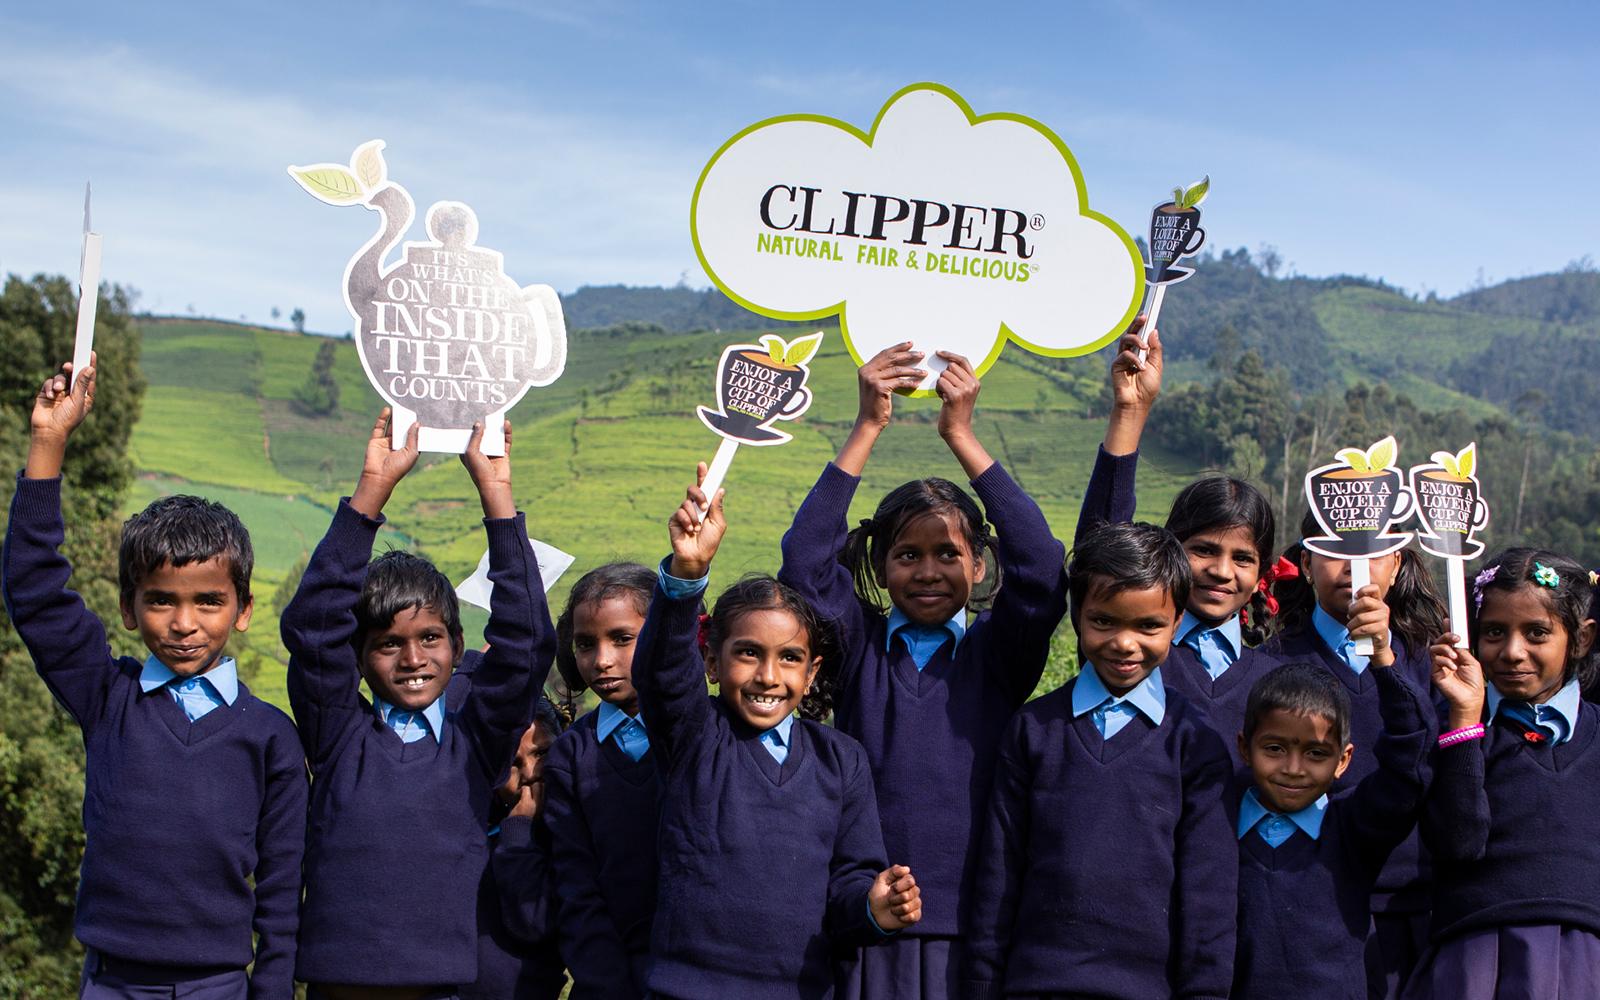 Clipper supports local school children